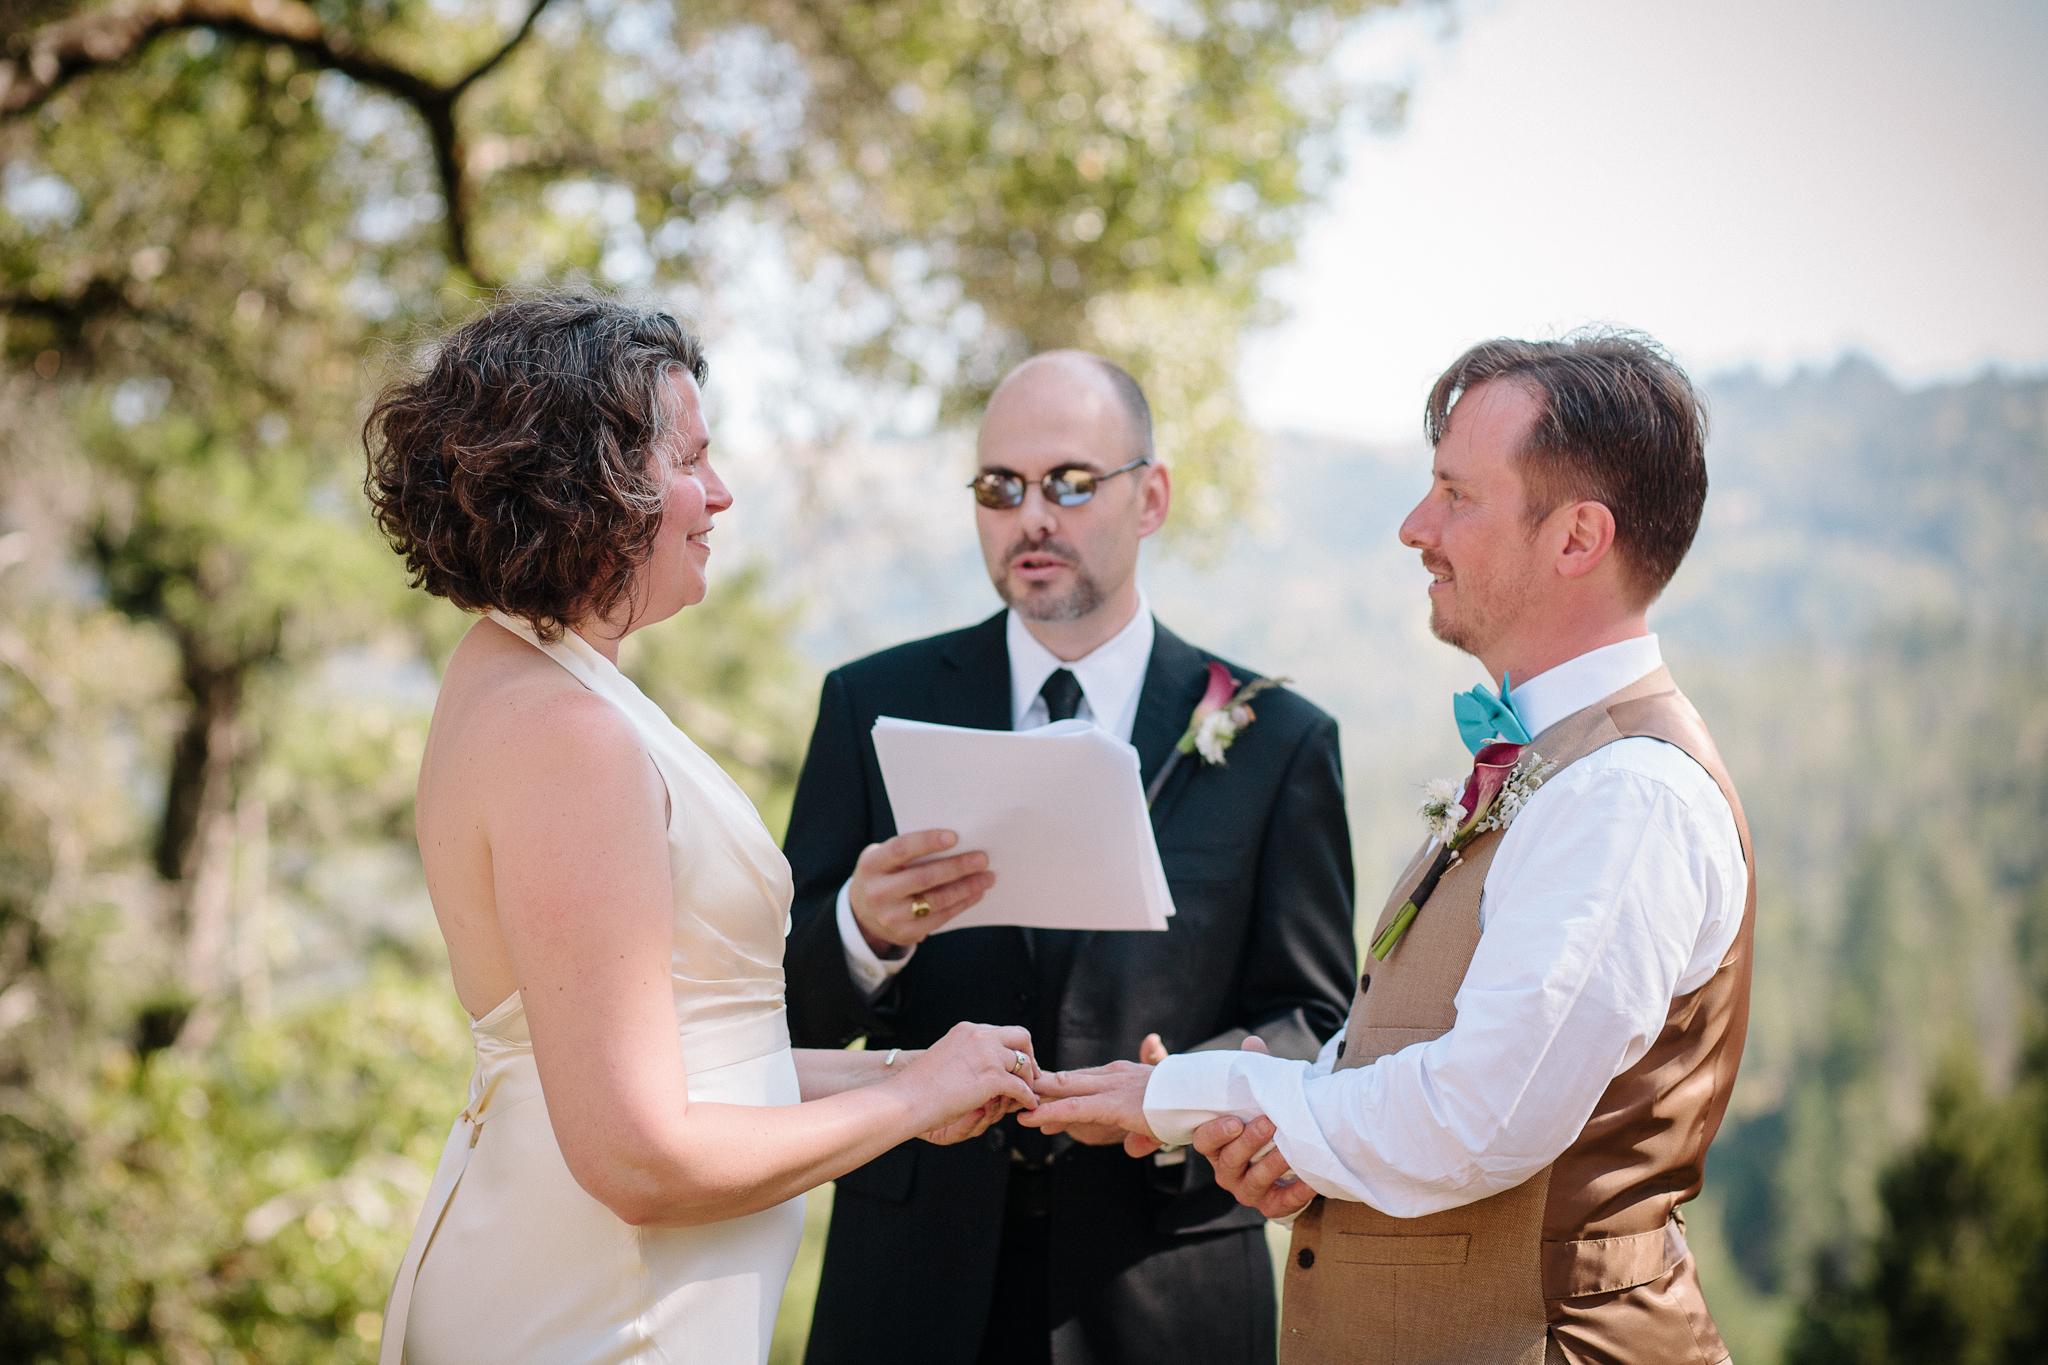 crystalchristiaan_weddingsneakpeek_2014_jenniferleahyphotography-19-of-43_14139921408_o.jpg